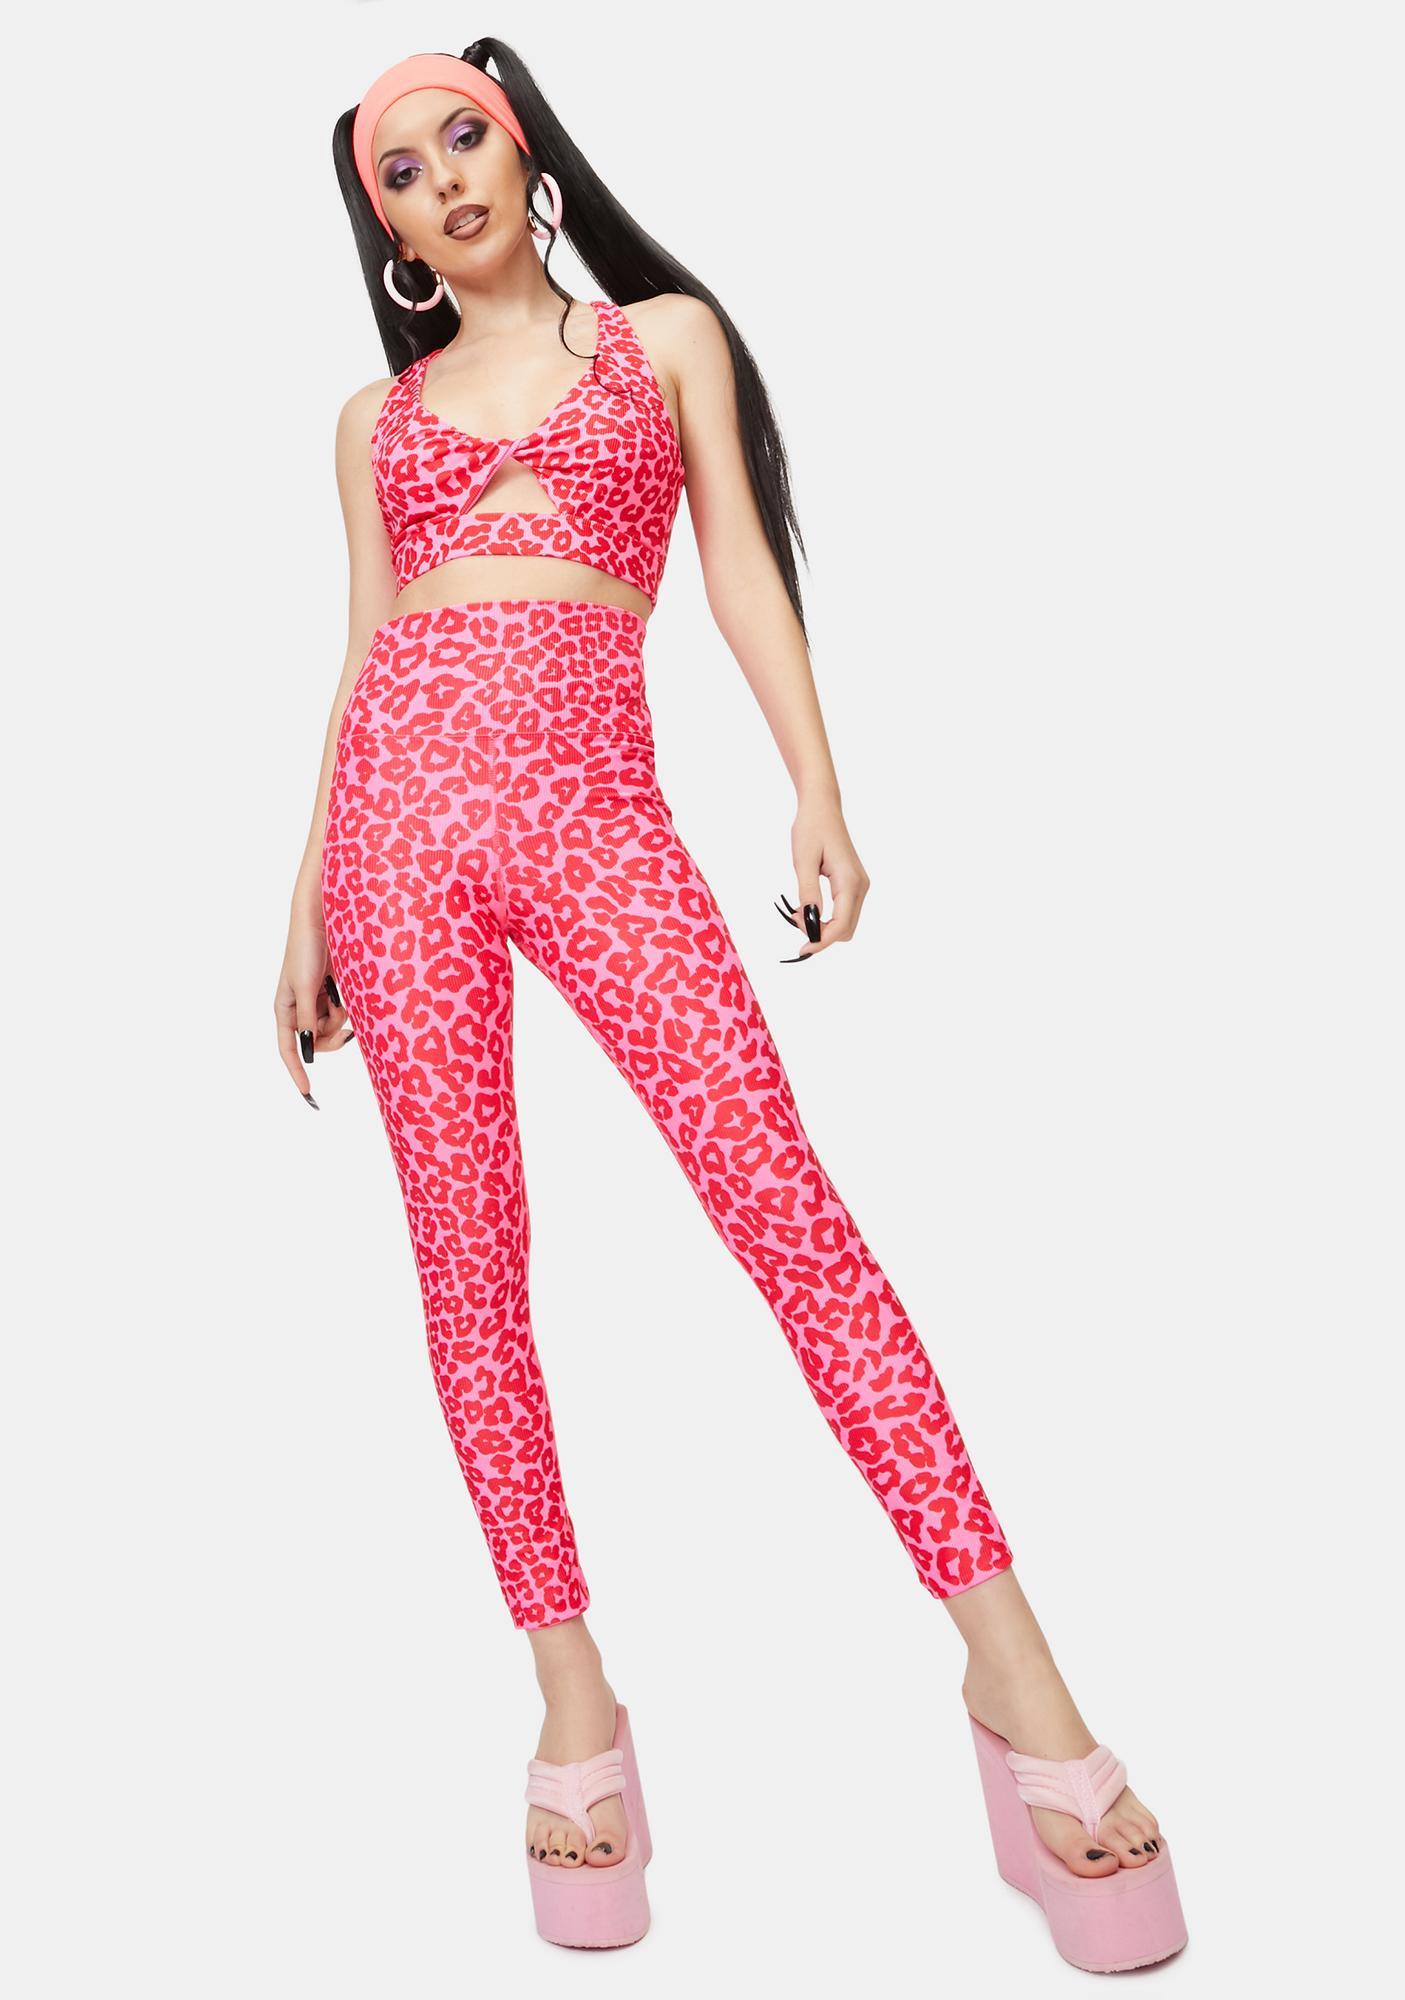 Beach Riot Leopard Love Ayla Printed Leggings